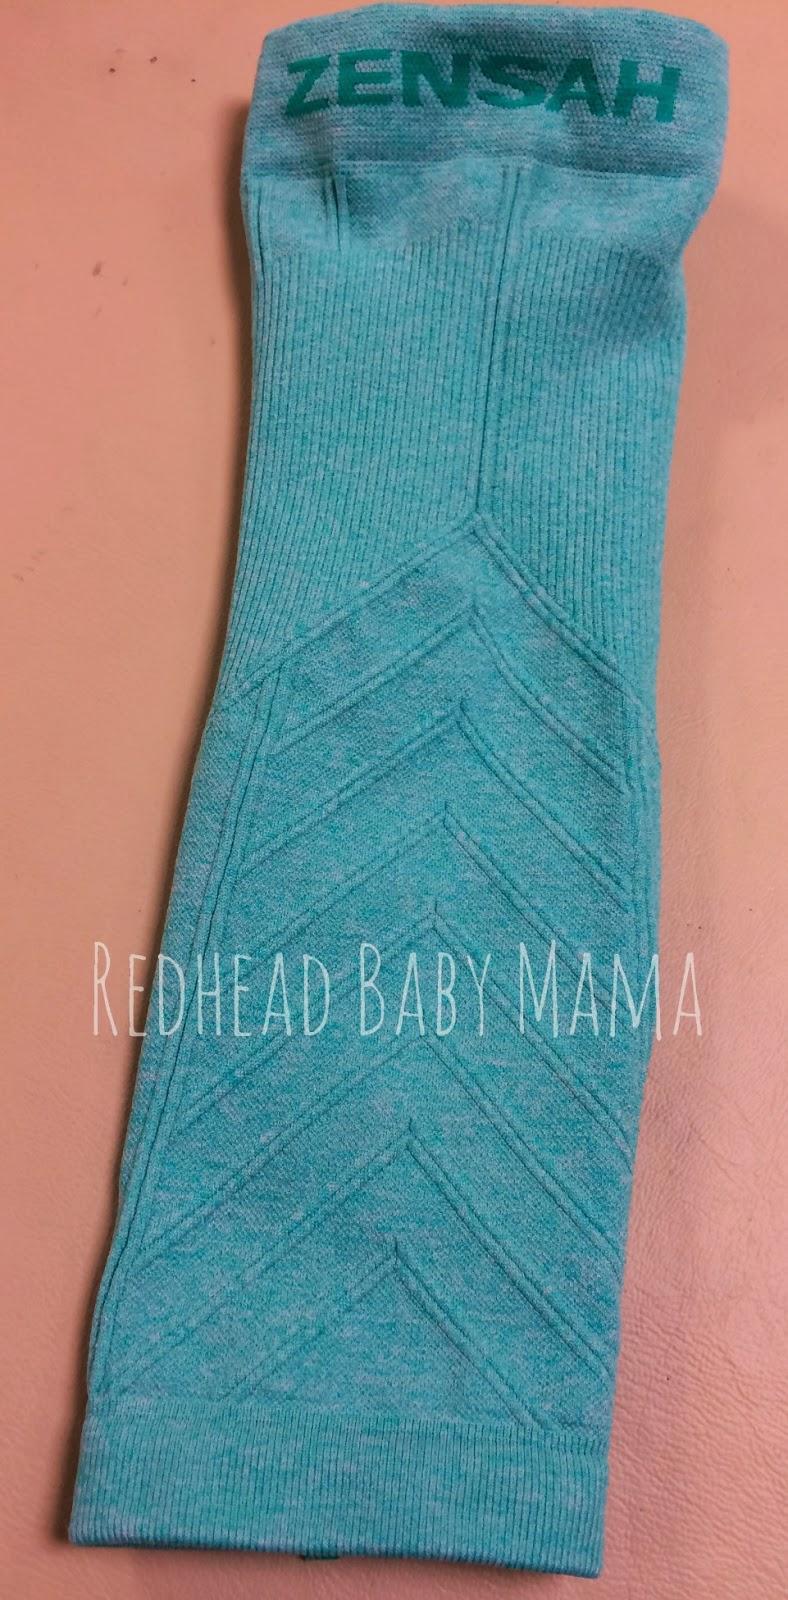 How to Paint Zensah Leg Sleeves - Redhead Baby Mama